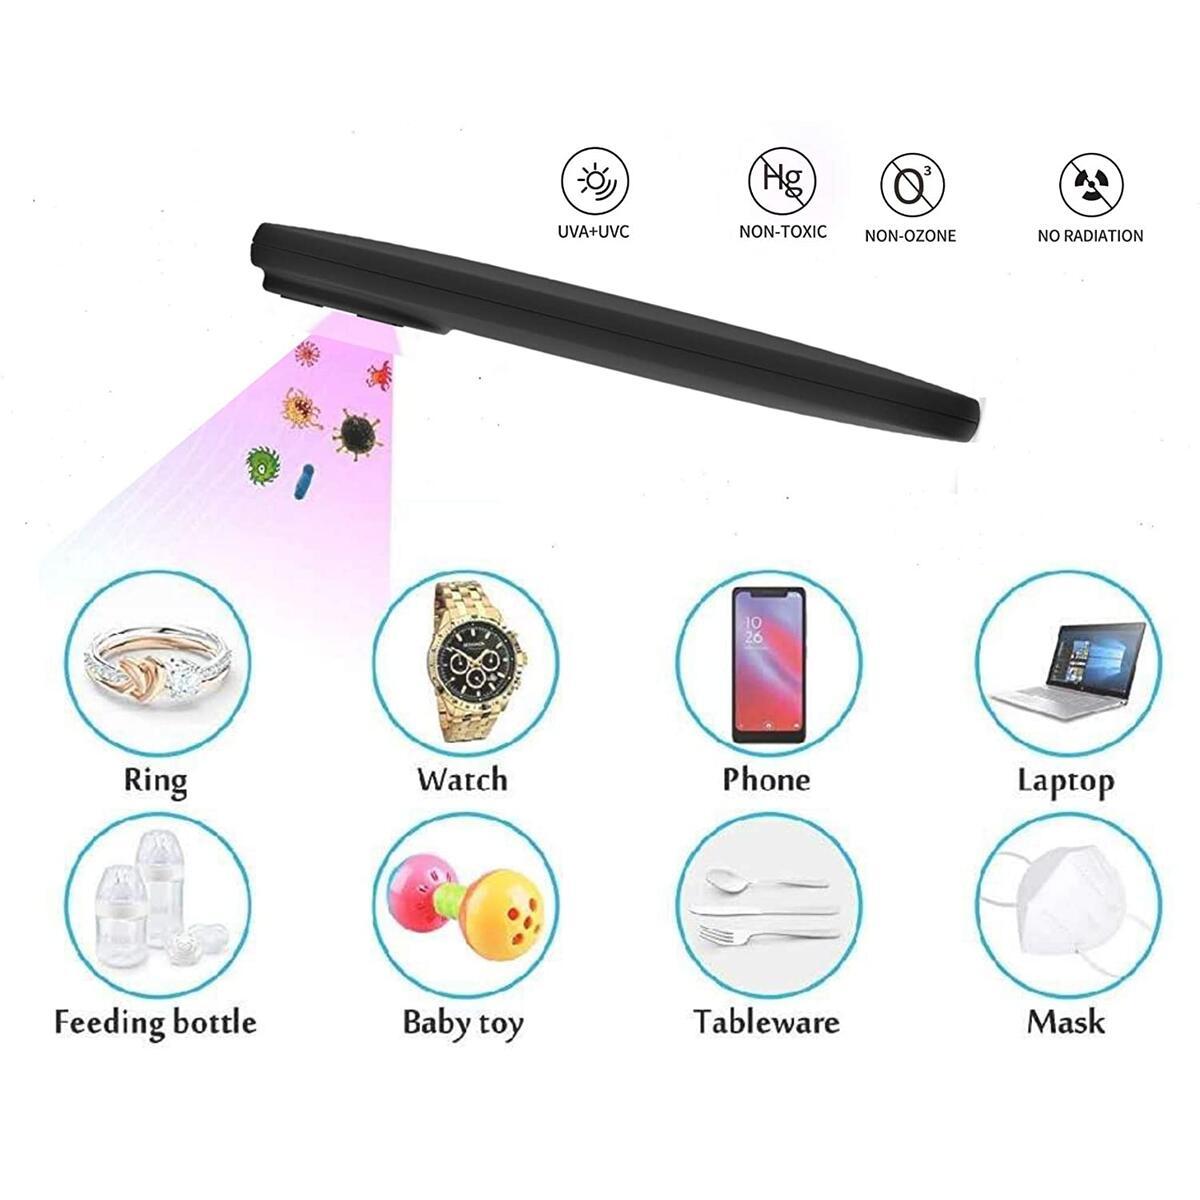 eLegio UV Light Sanitizer Wand, Portable Ultraviolet Technology, Hendheld UVC Sterilizer Lamp, Mini Stick Disinfection and Sanitizing, Mobile, Door knobs, Cars, Travel, Premium